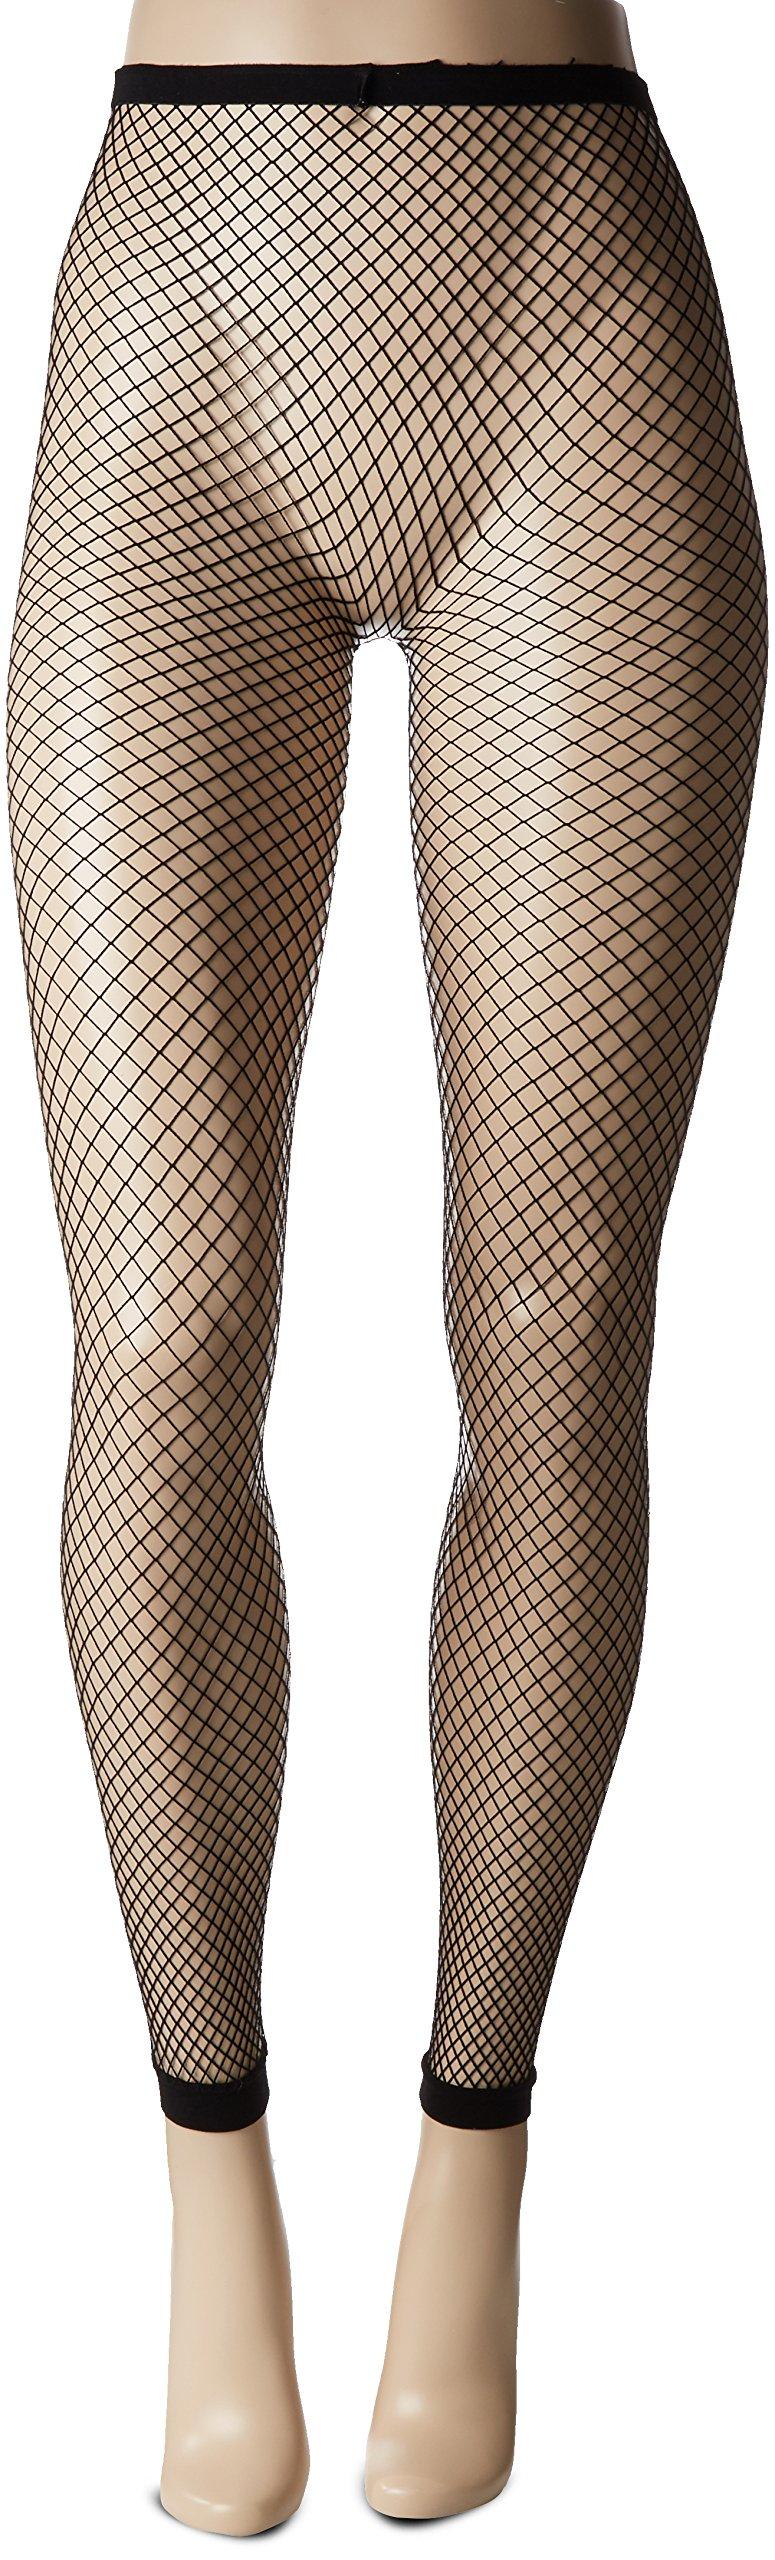 HUE Women's Footless Fishnet Tights, Black, M/L